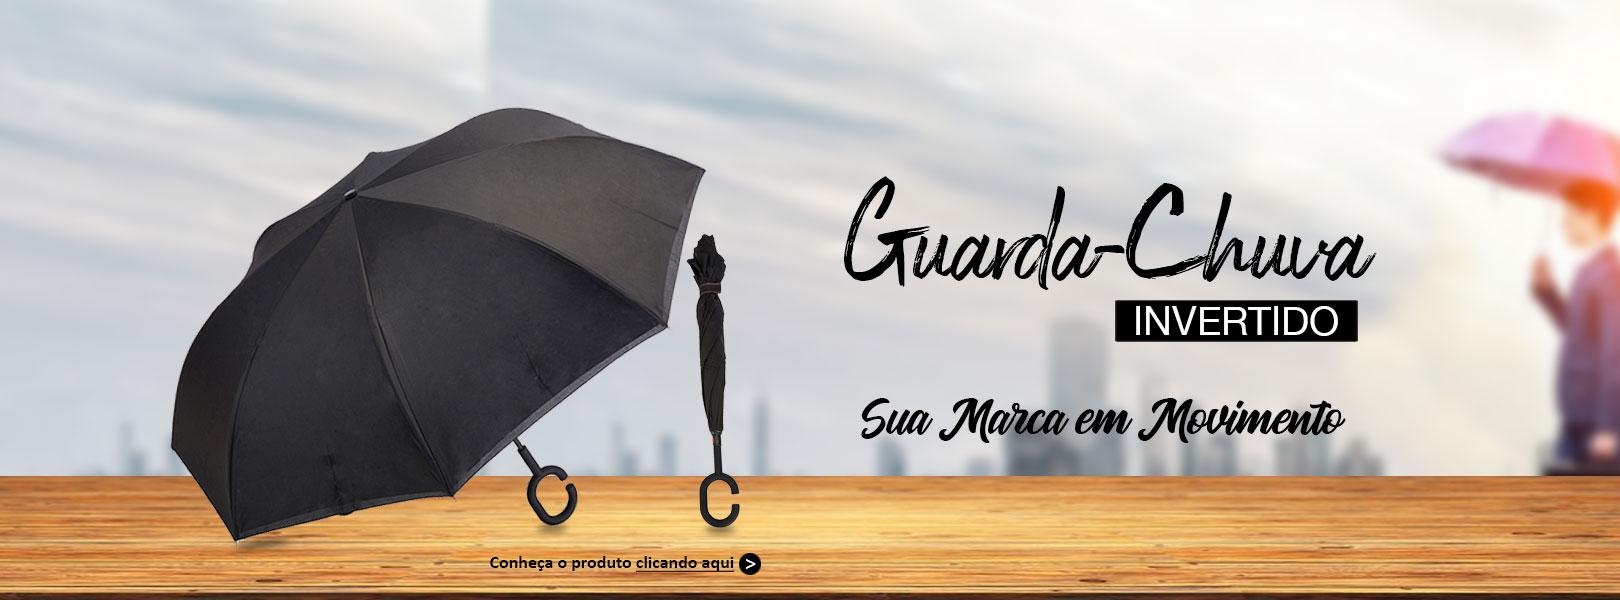 https://vibepromo.com.br/brinde/guarda-chuva-invertido-2078/